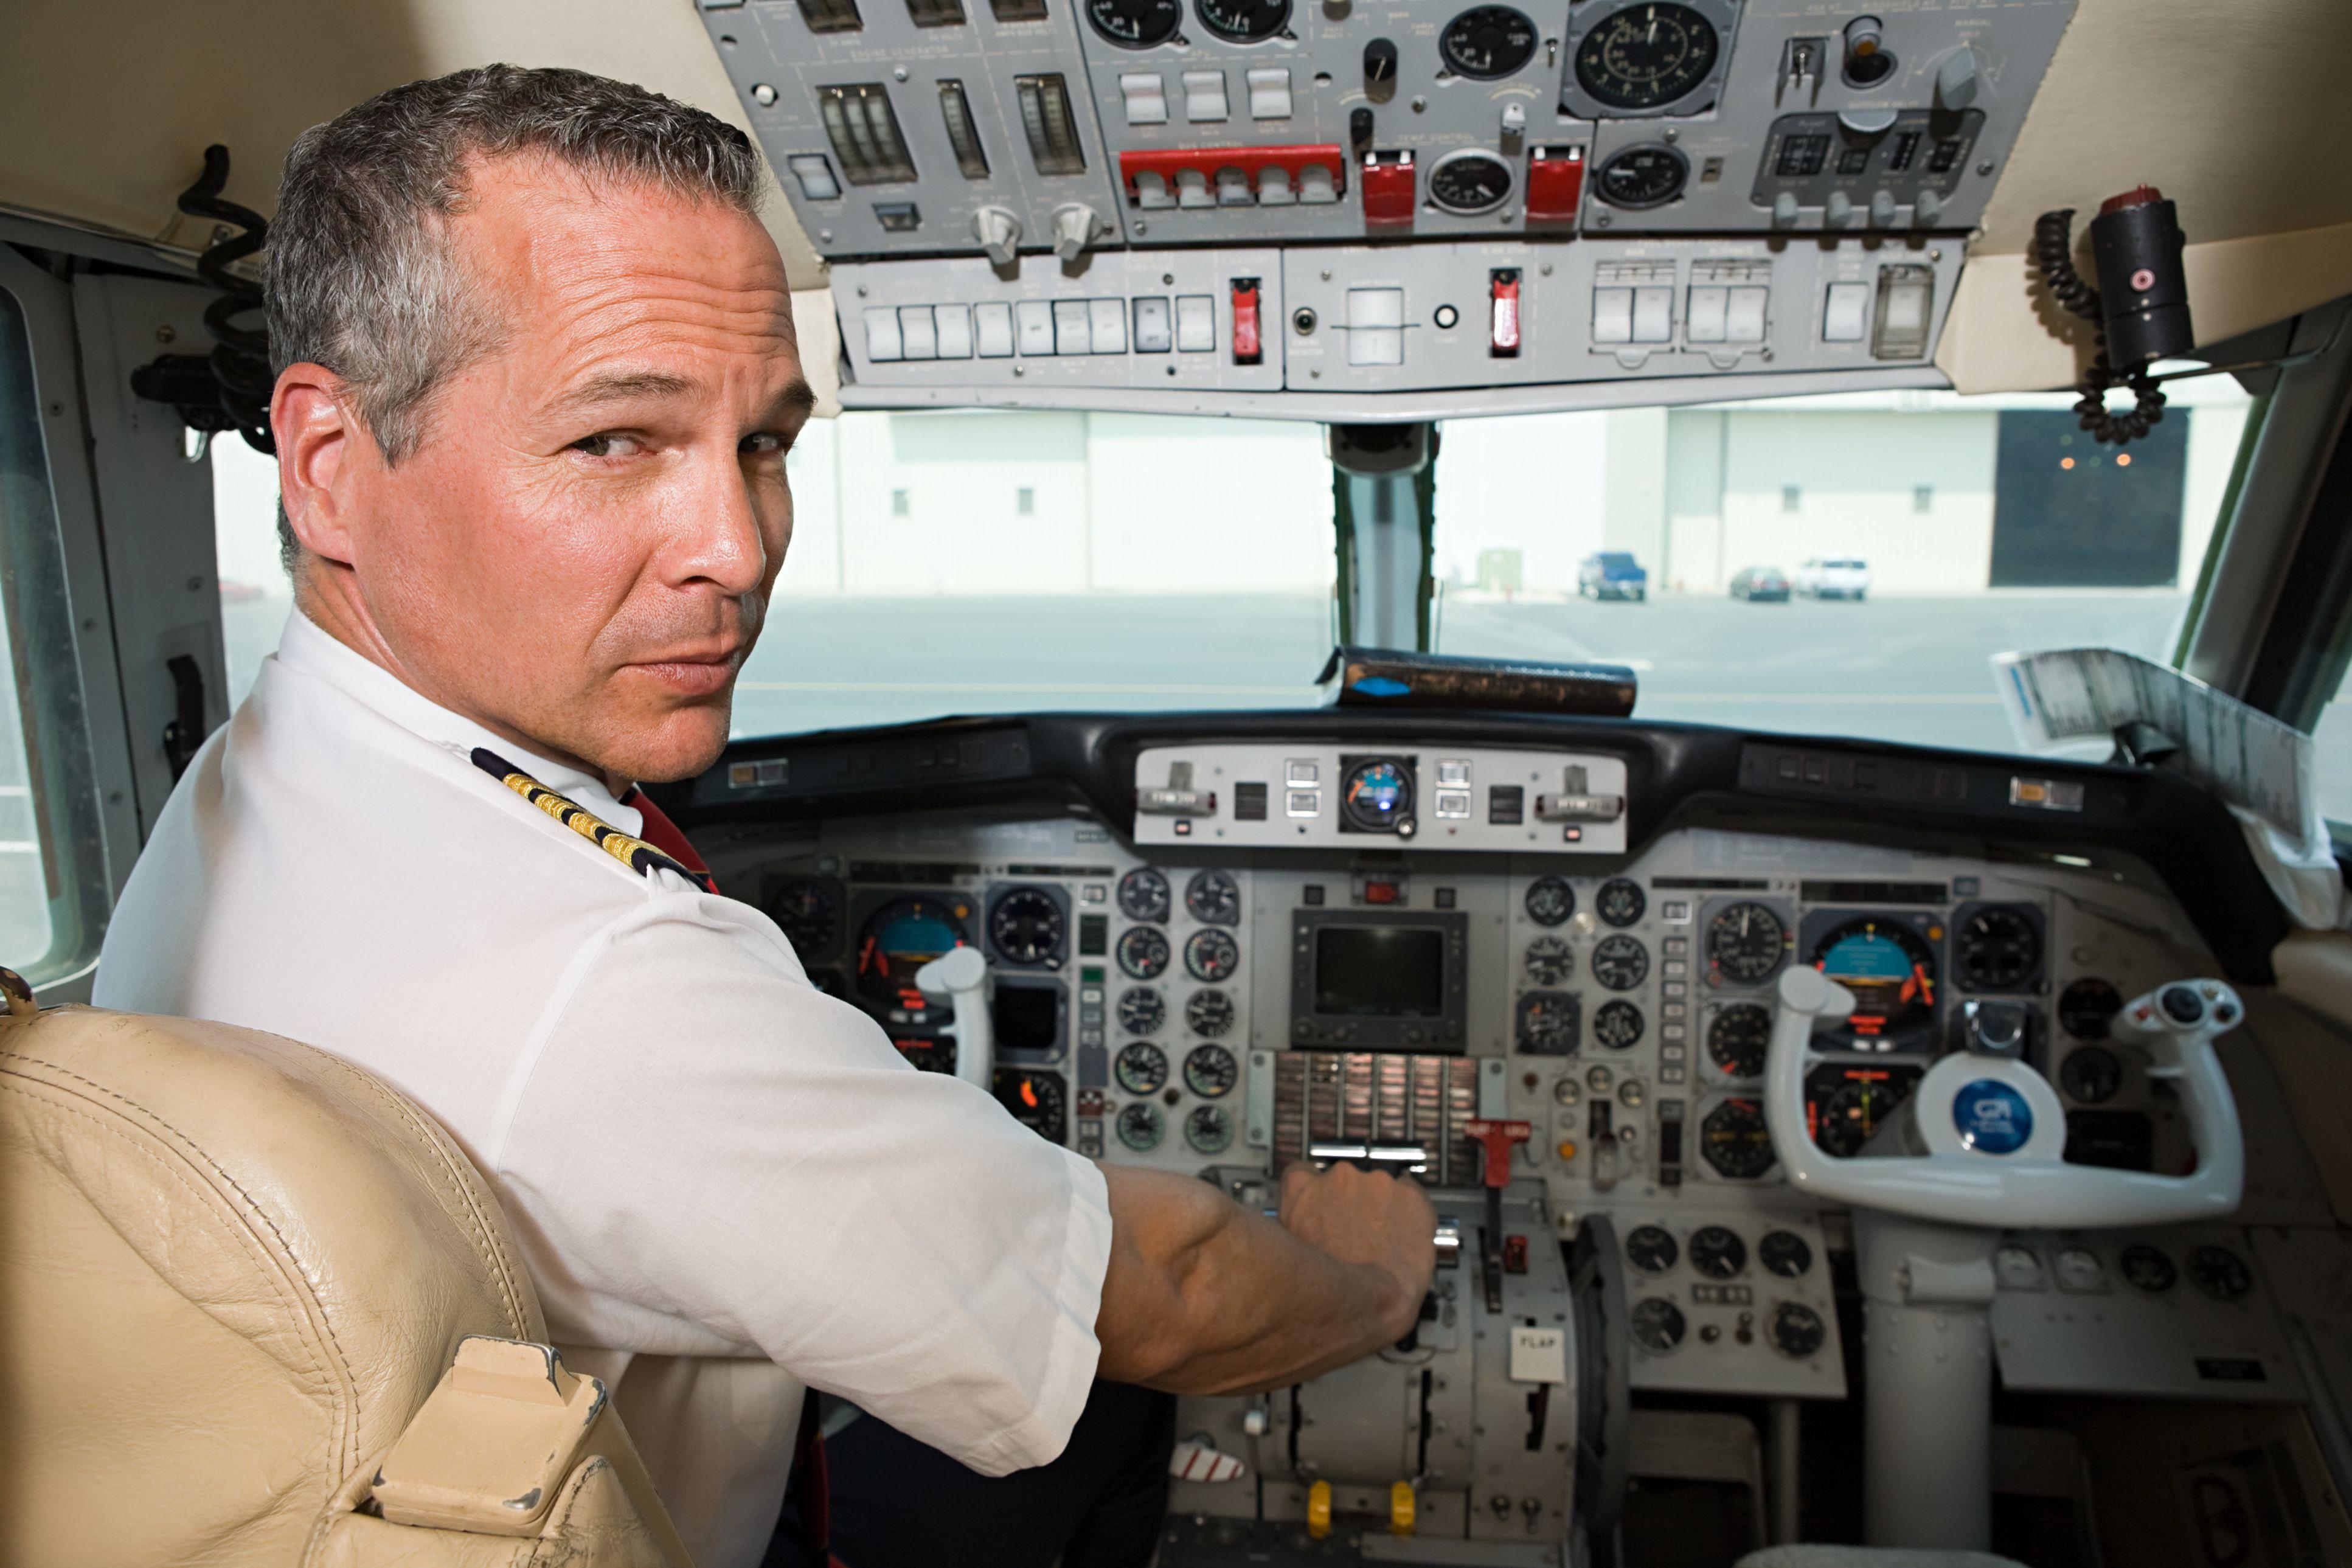 Pilot Career Information 526120